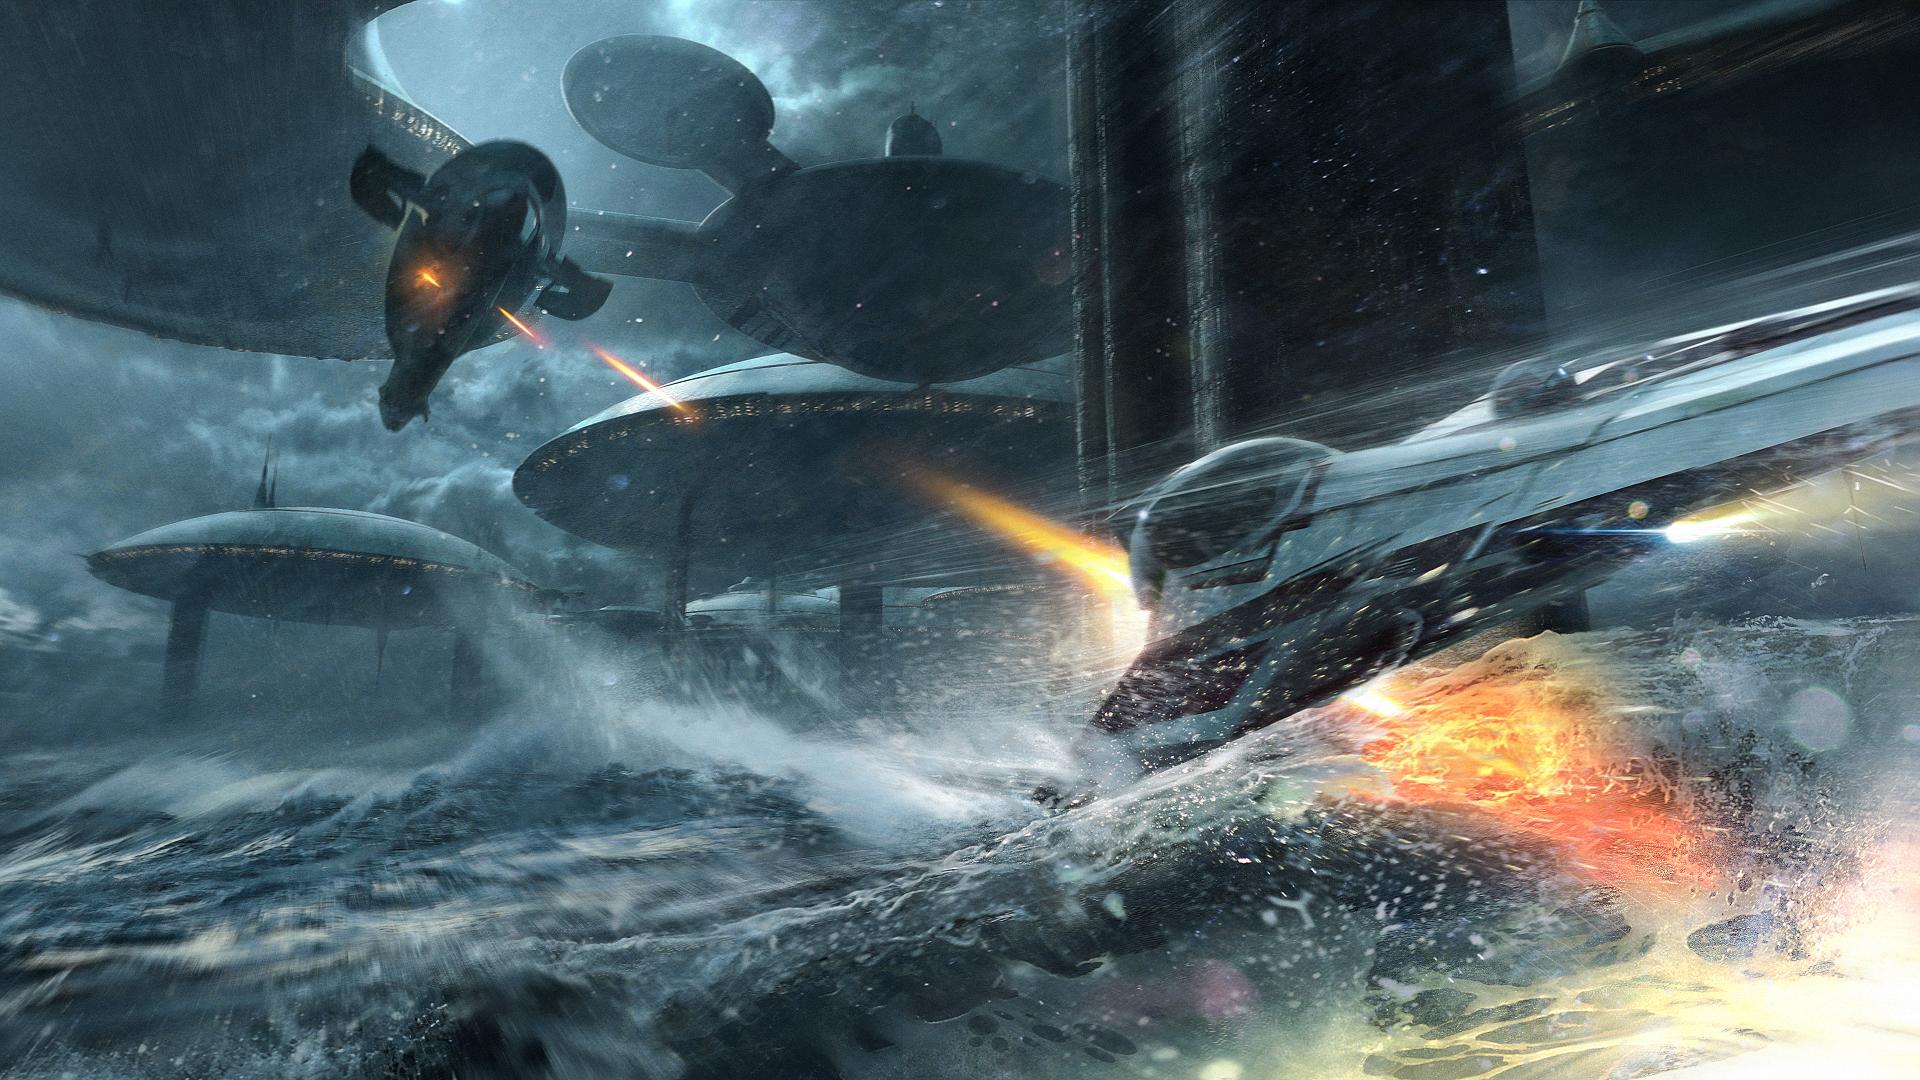 Star Wars Battlefront Ii Closed Alpha New Gameplay Videos Showcase